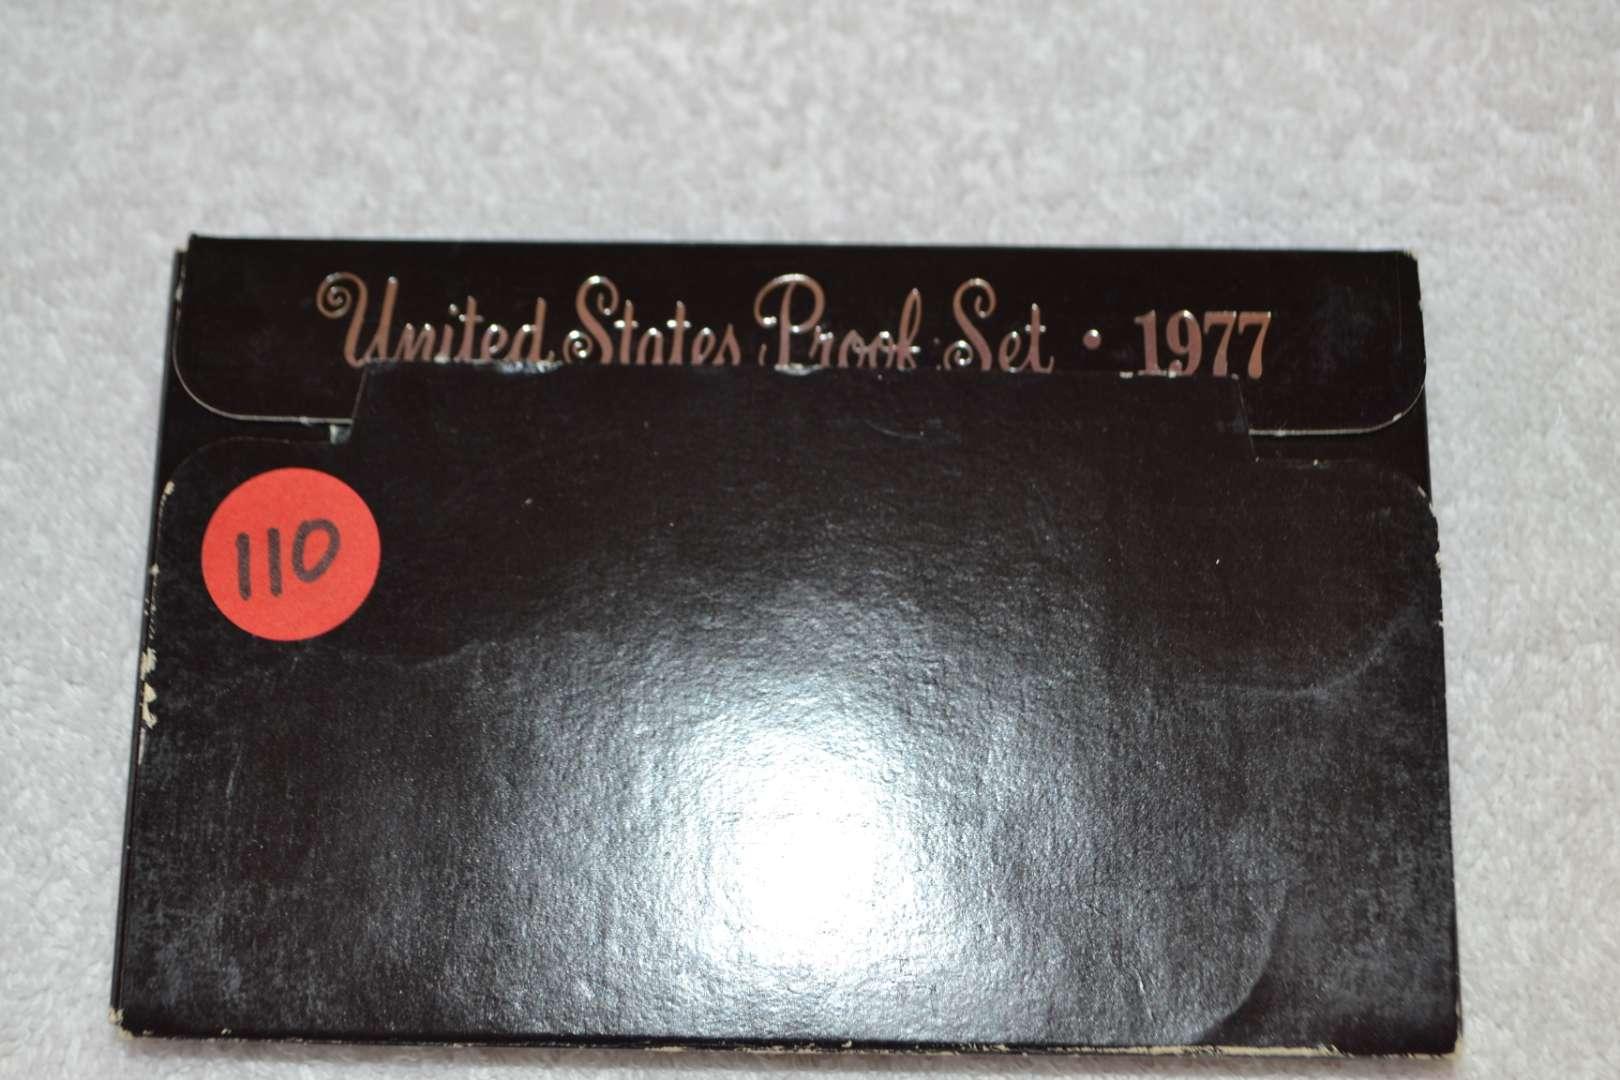 Lot # 110 1977 UNITED STATES PROOF SET